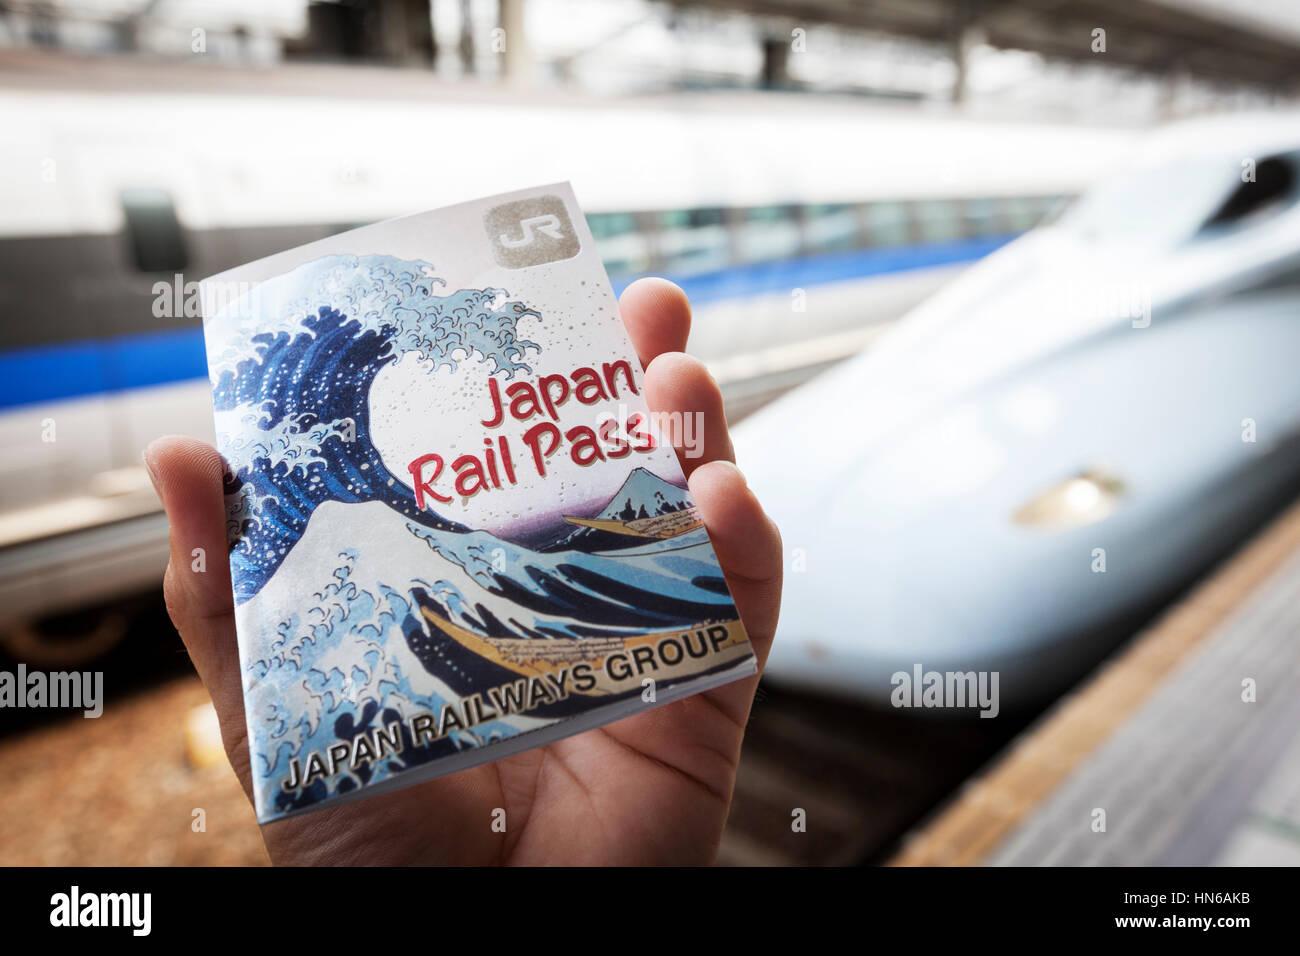 Okayama, Japan - May 8, 2012: Close-up of a male hand holding a Japan Rail Pass at Okayama train station with Shinkansen - Stock Image